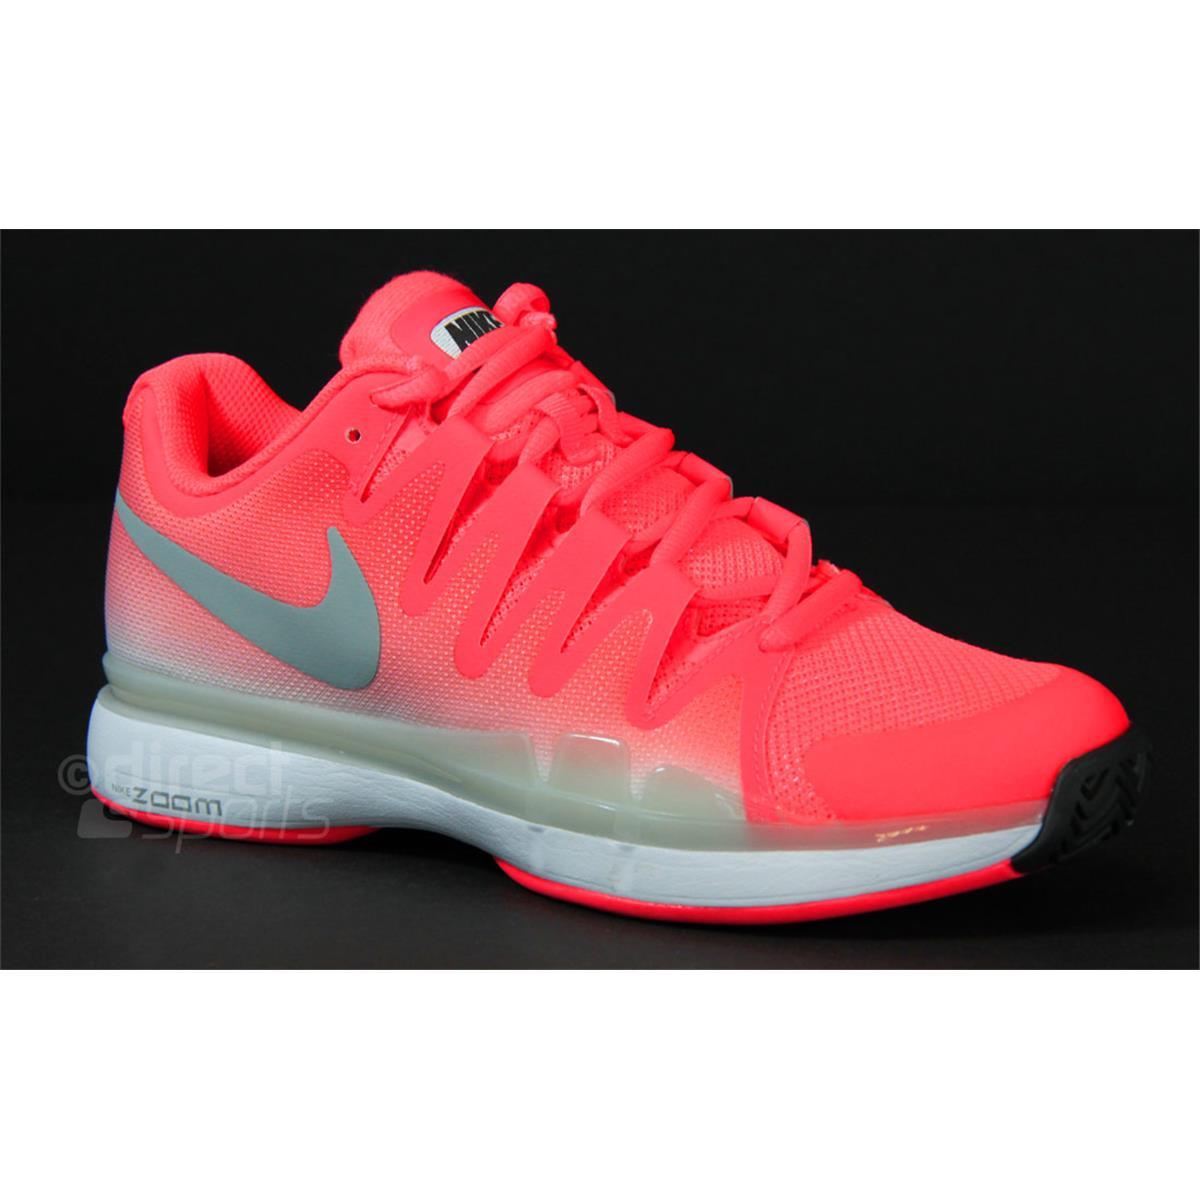 Nike Vapor Court Tennis Shoes India